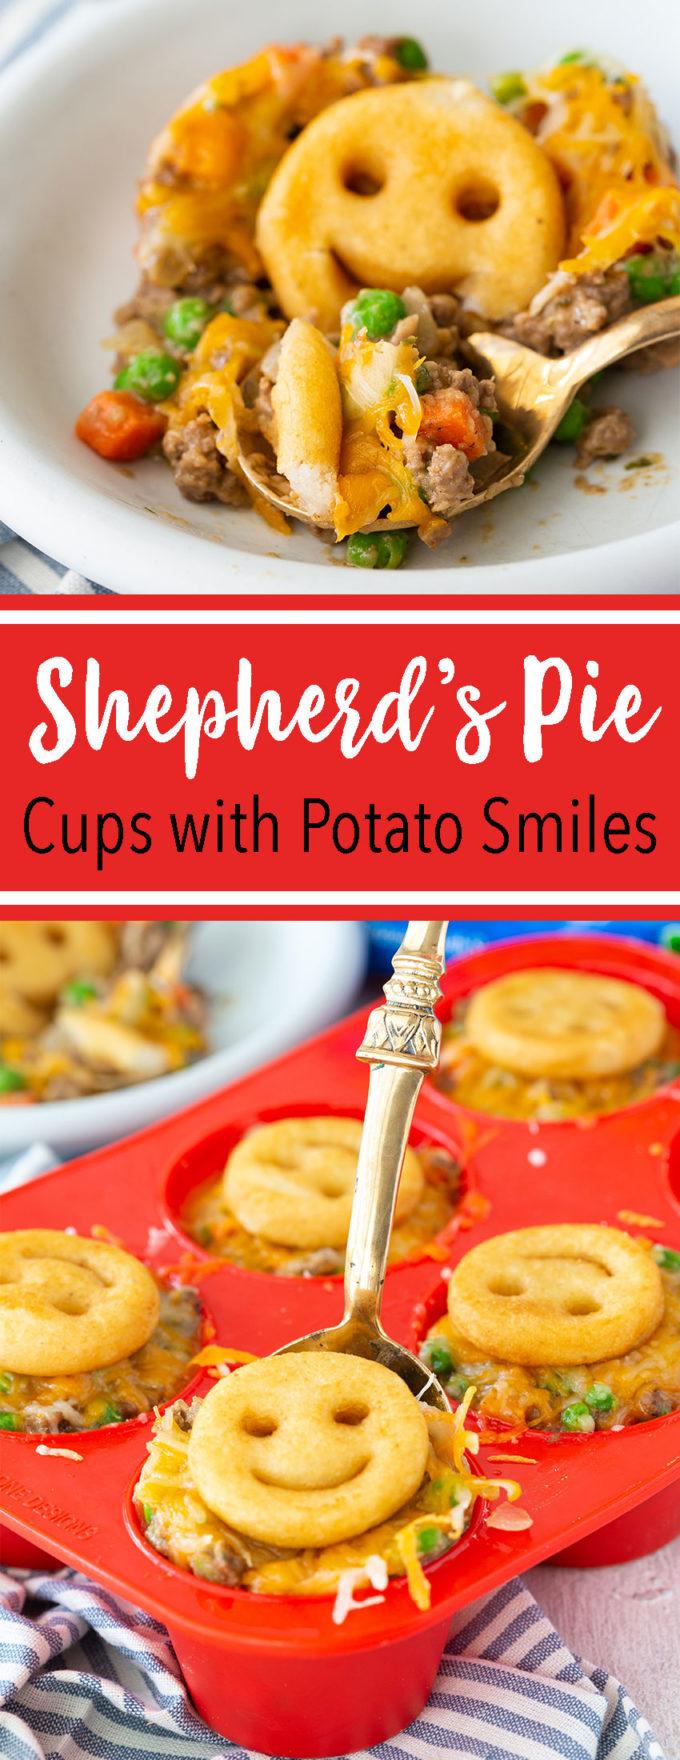 Shepherd's Pie mini cups